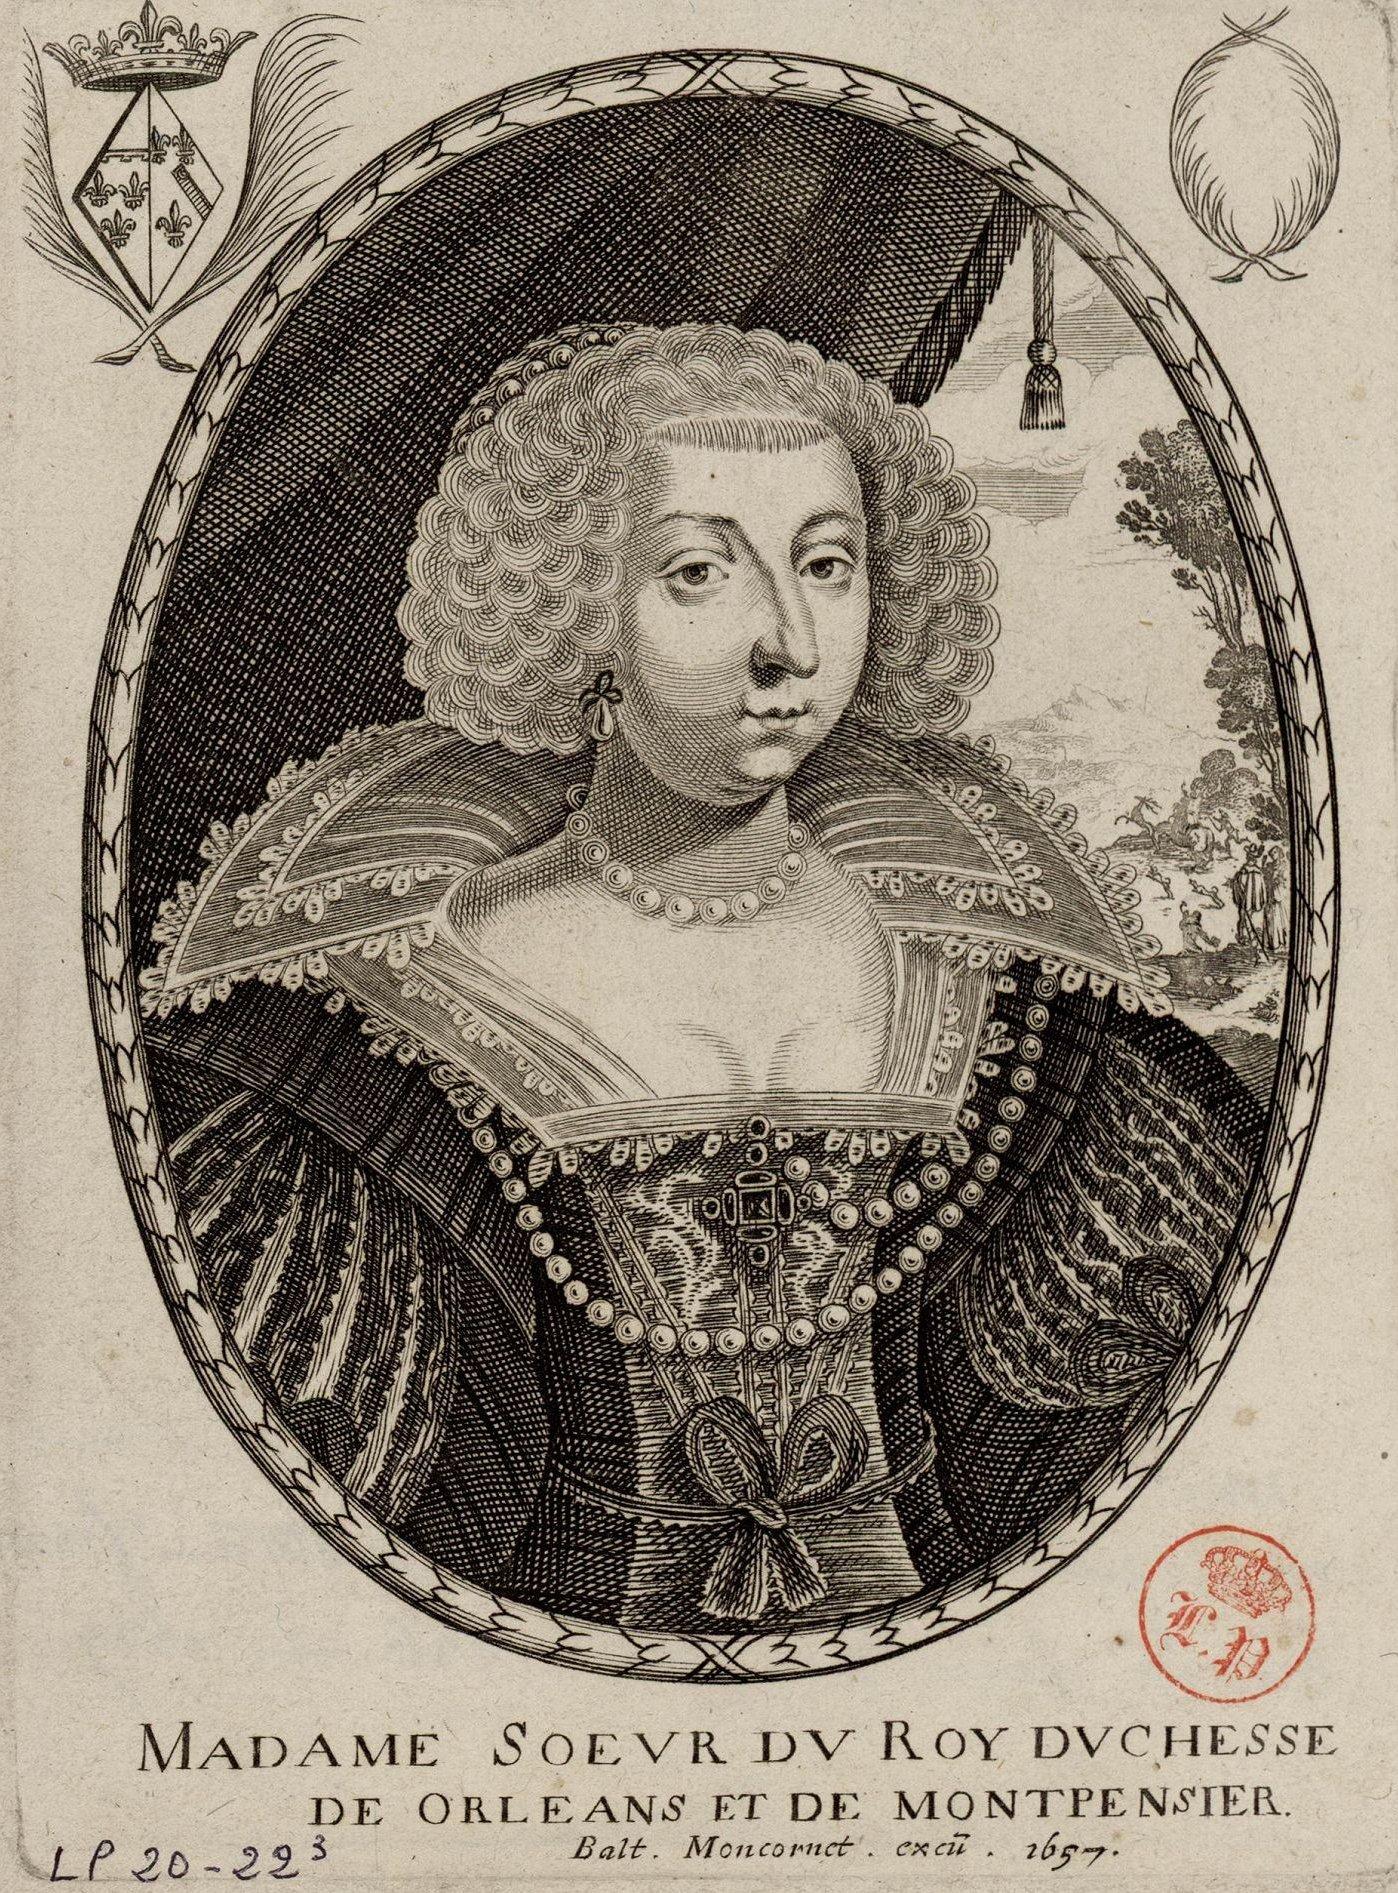 1657 Marie de Bourbon, Duchess of Orléans and Montpensier by Balthasar  Moncornet